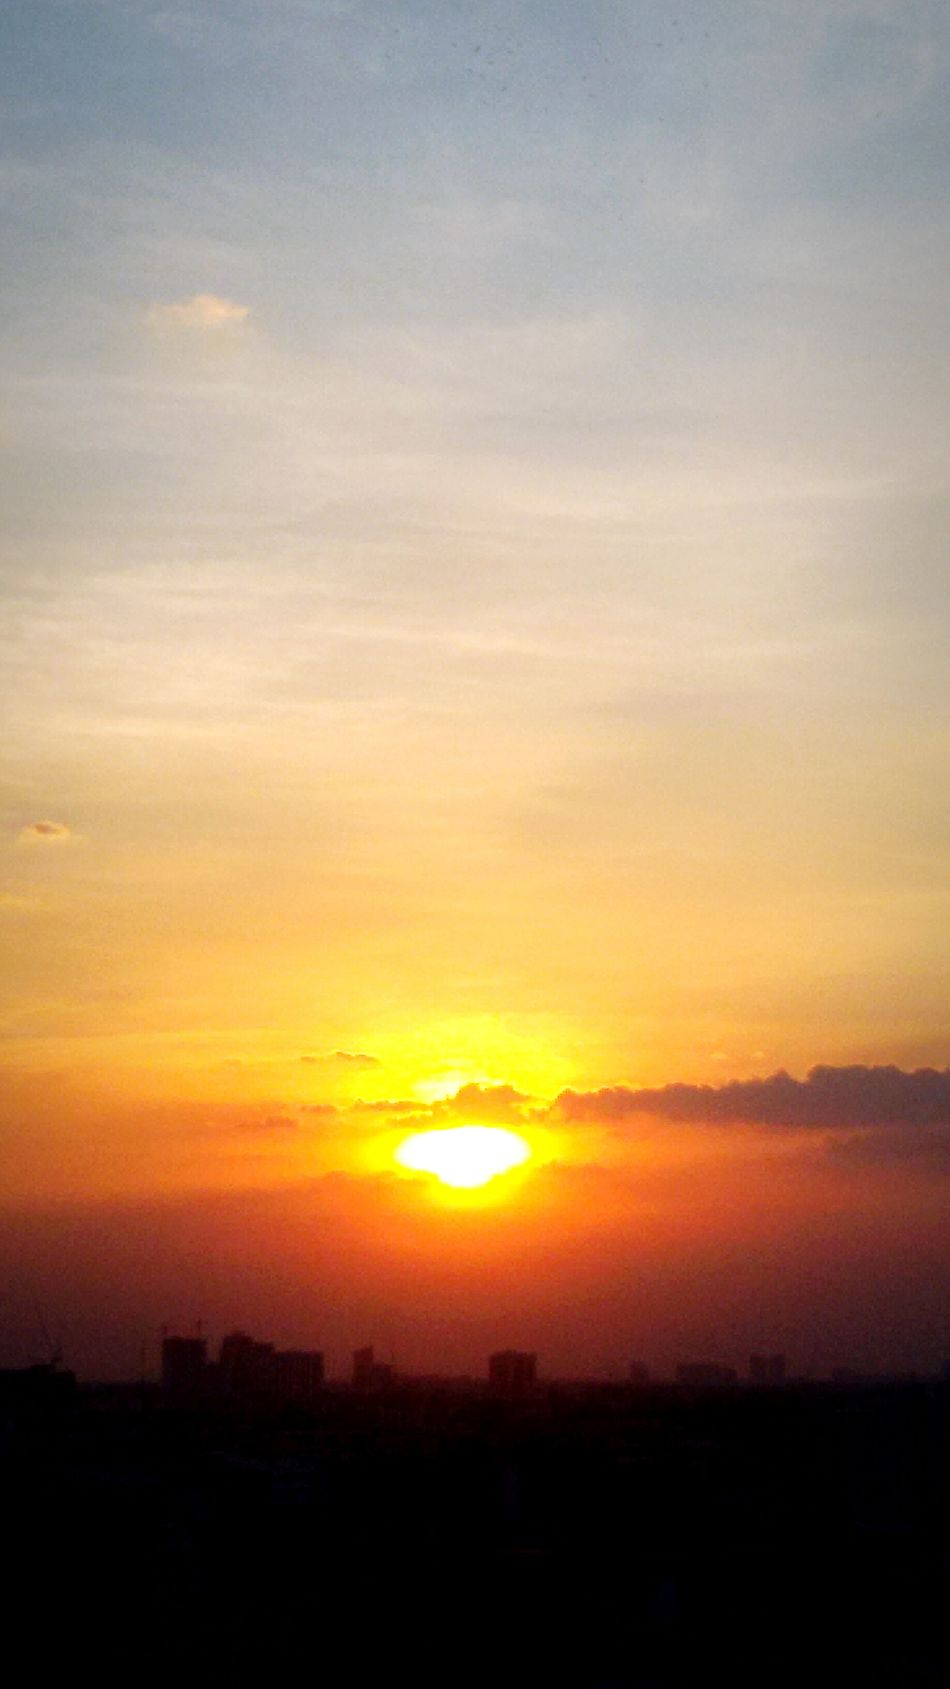 Sunset, Sundown, early Night, Bangkok cityscape, Thailand, Getting In Spired. .